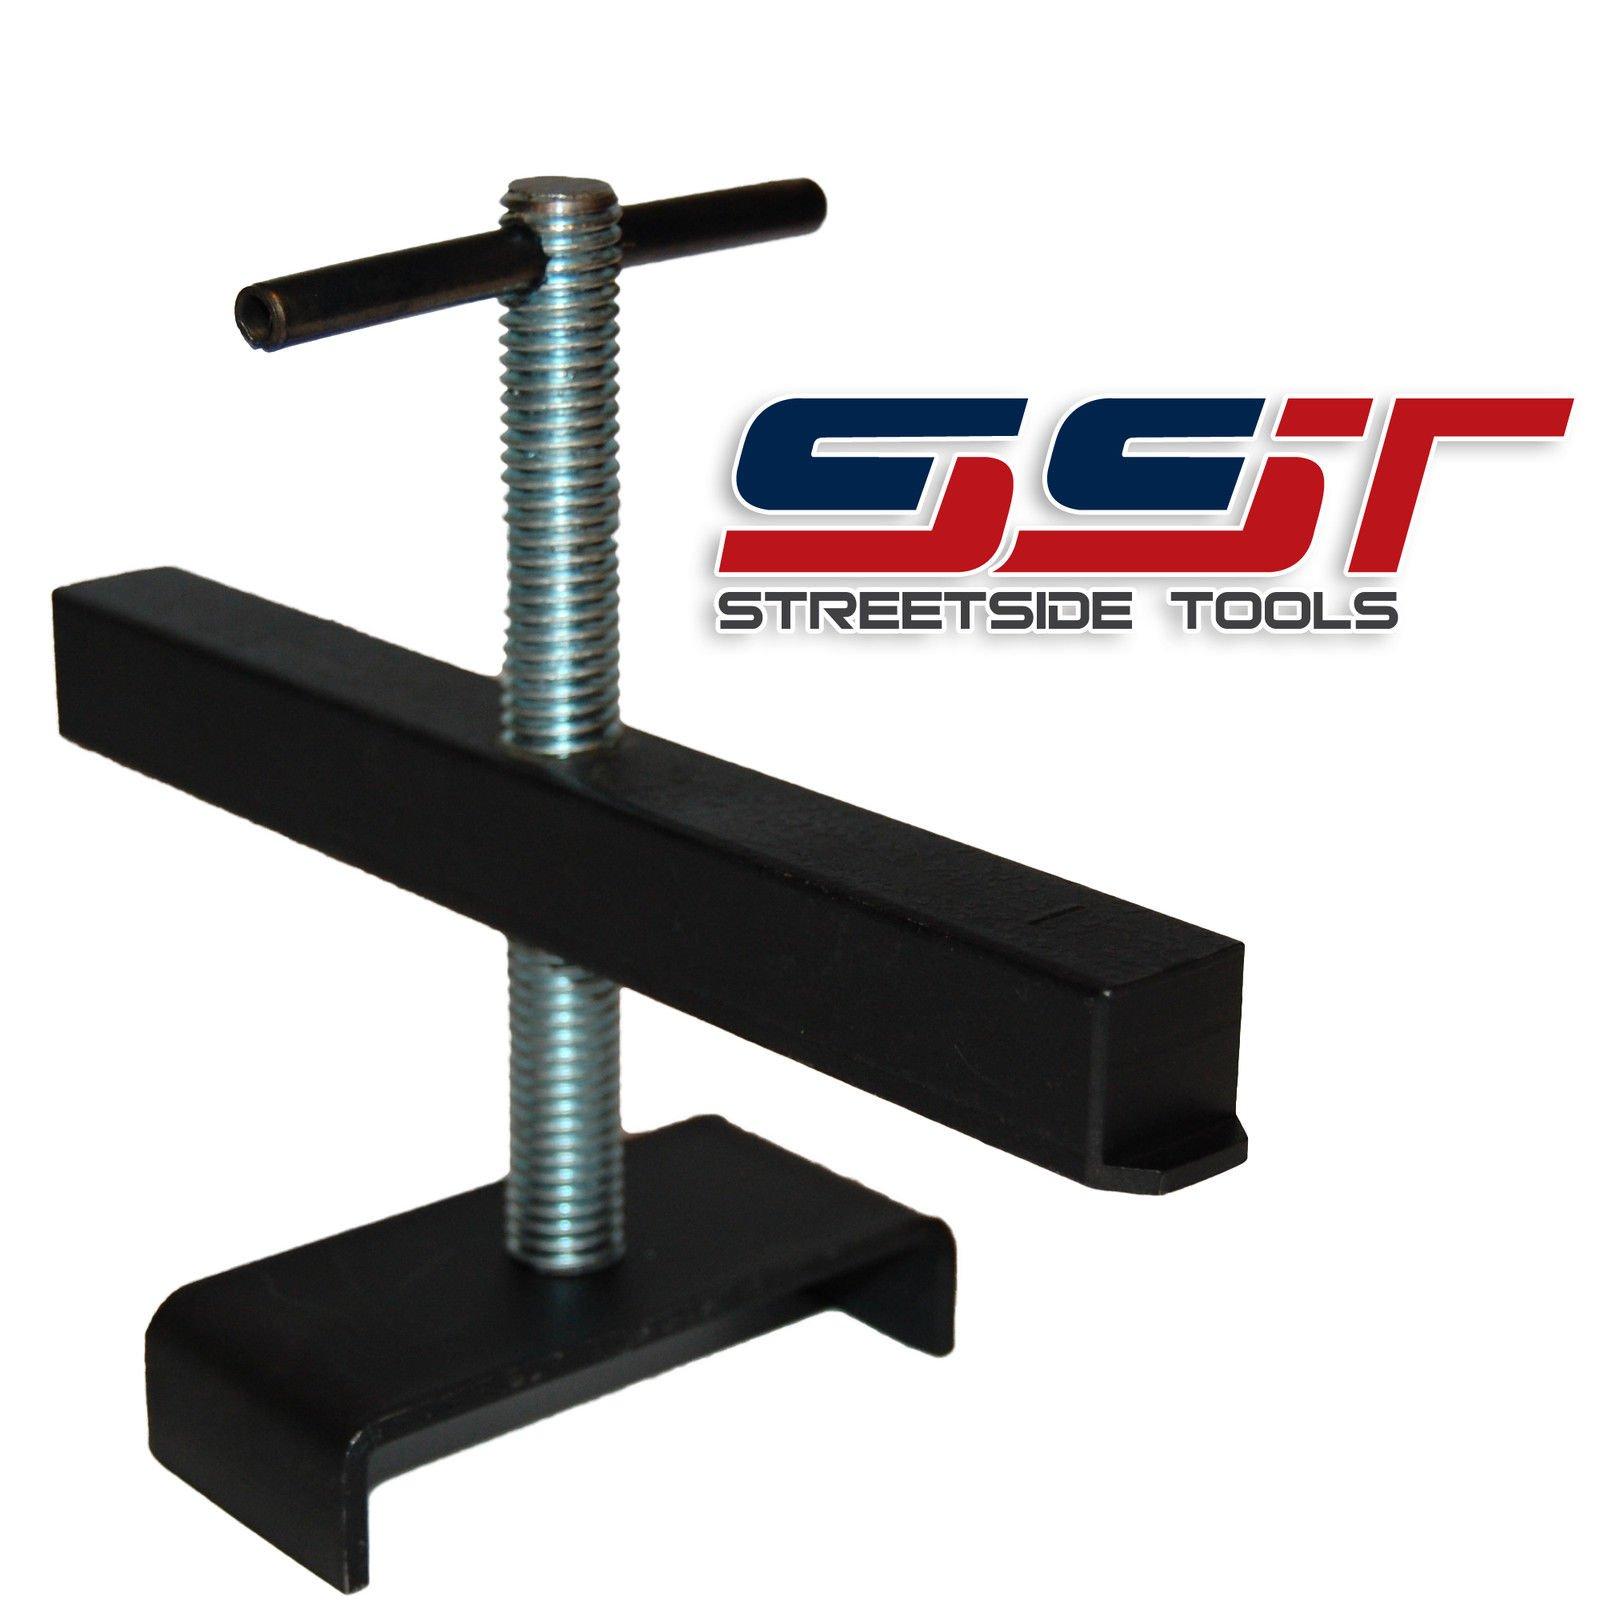 SST-0150 - GM - Powerglide ALGP Rear Clutch Spring Compressor Transmission Tool